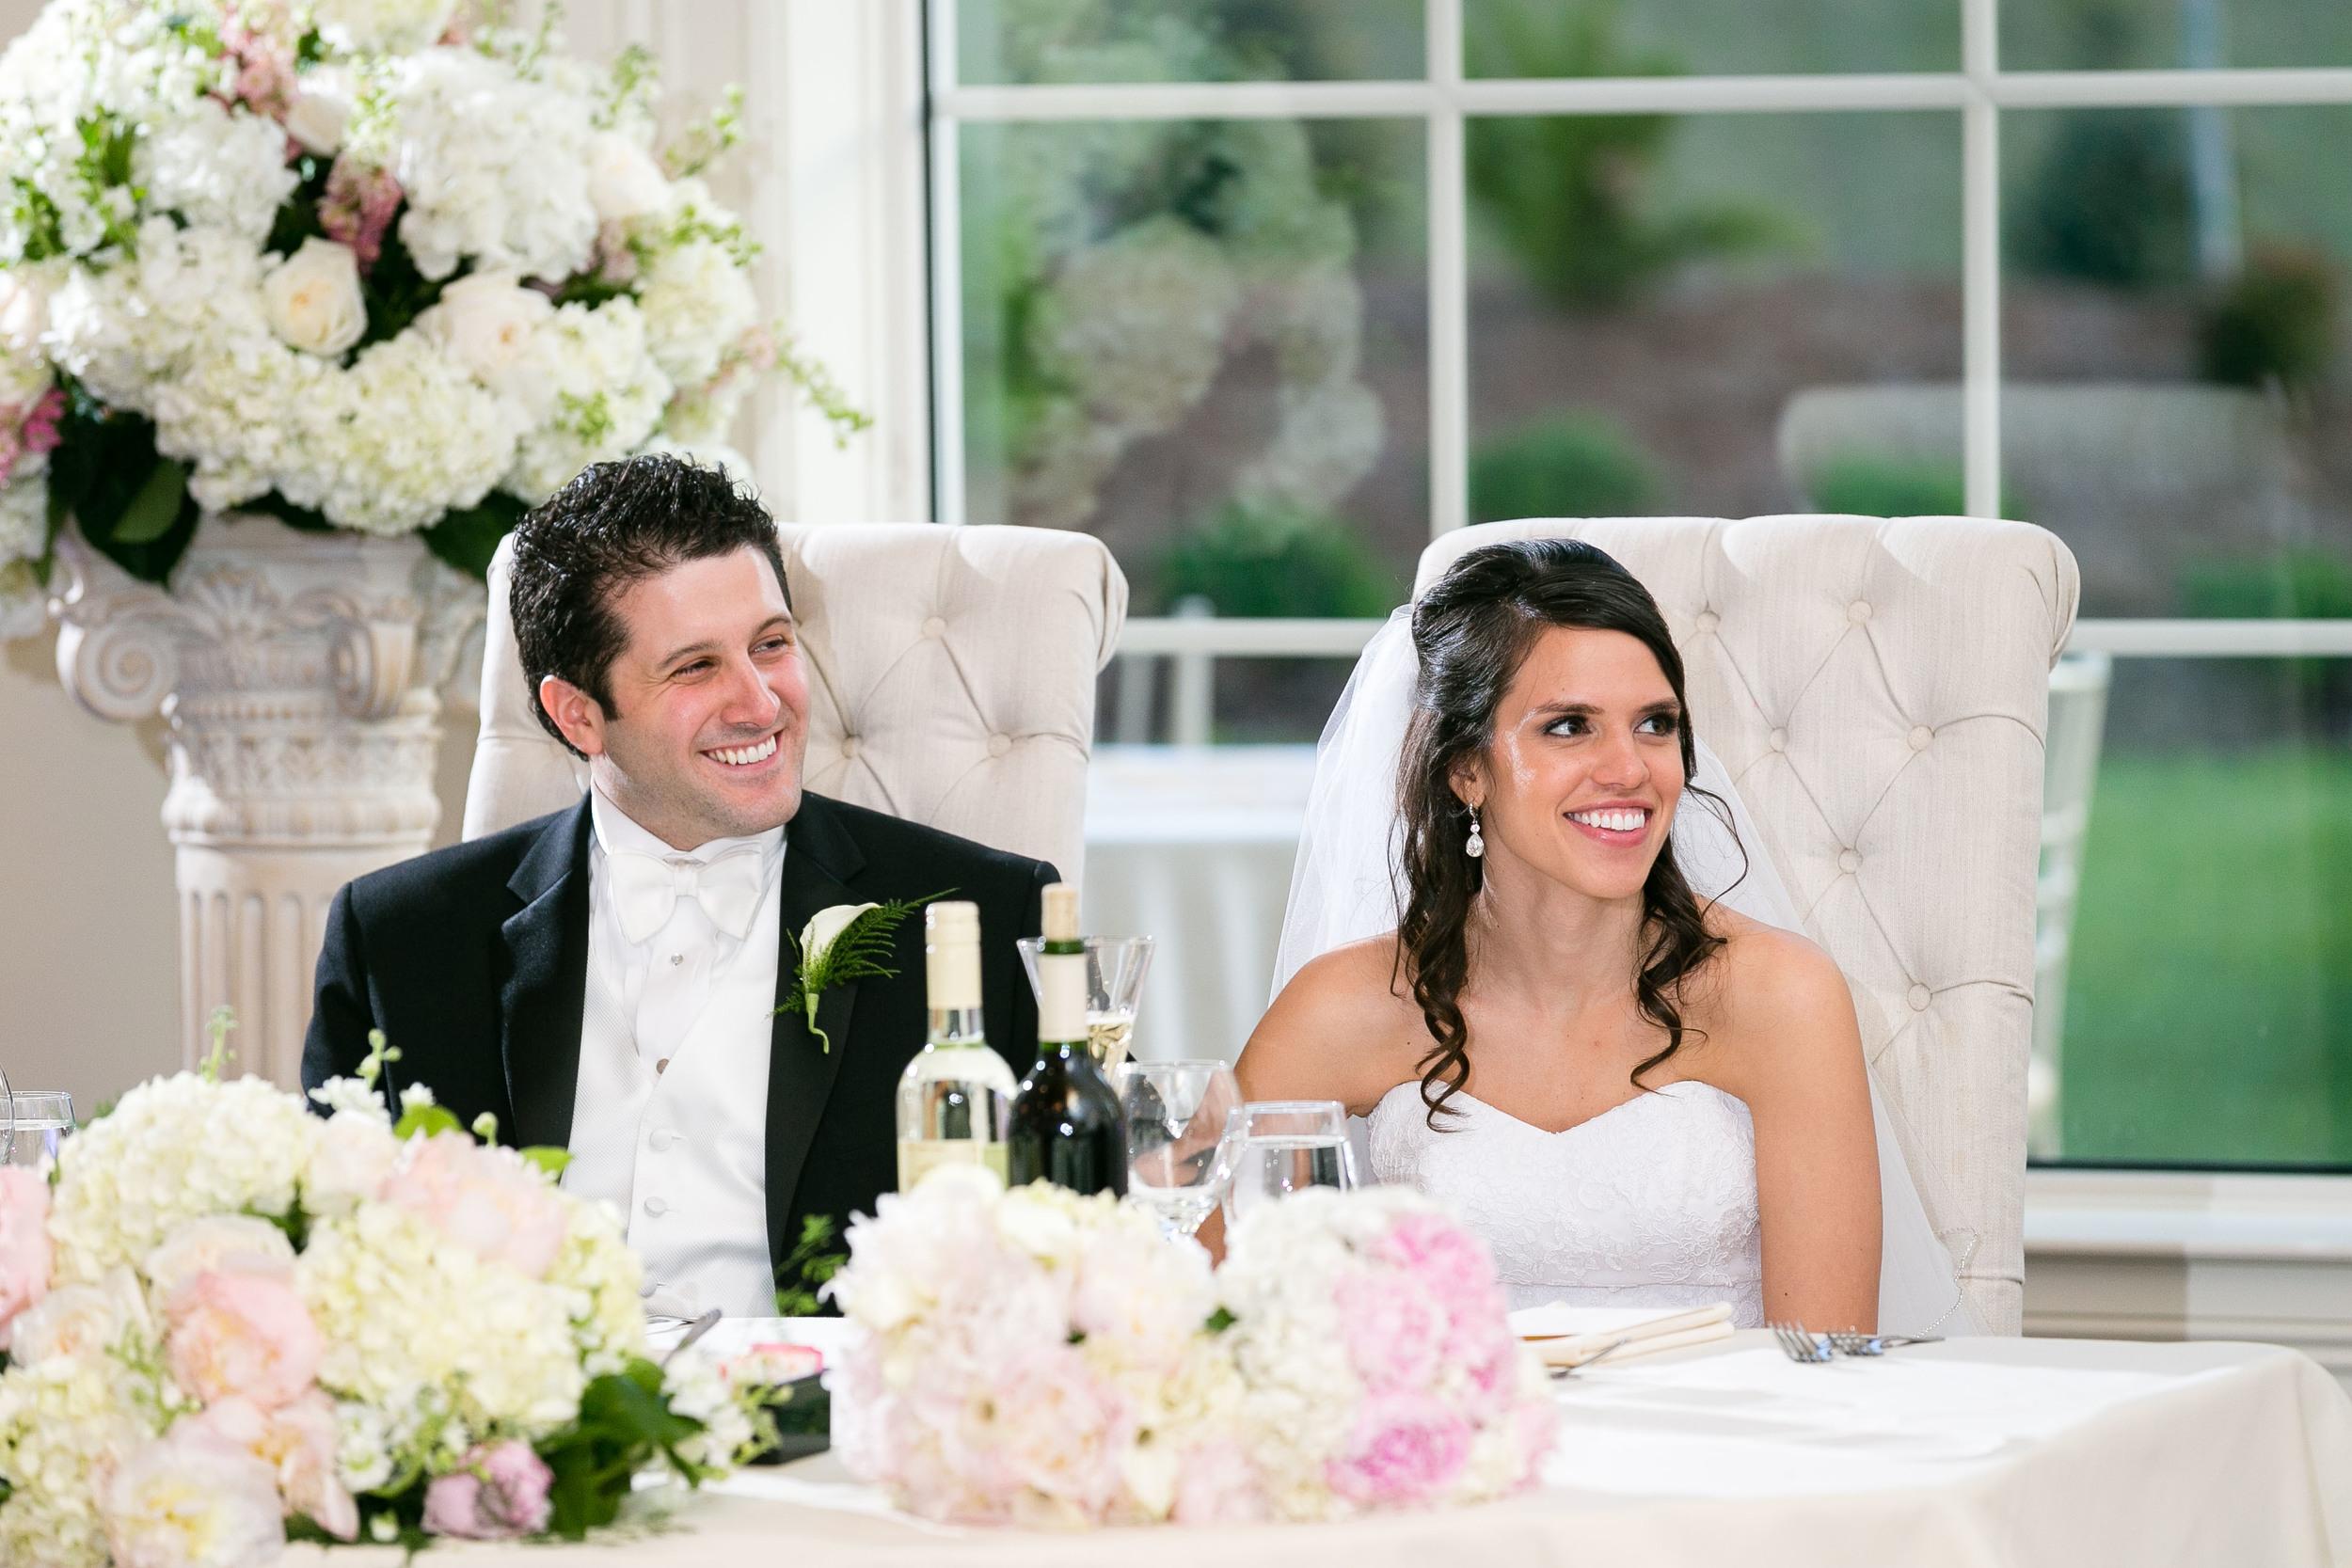 Romantic-Italian-Wedding-Aria-Prospect-Connecticut-Creative-Photography-Jacek-Dolata-21.jpg